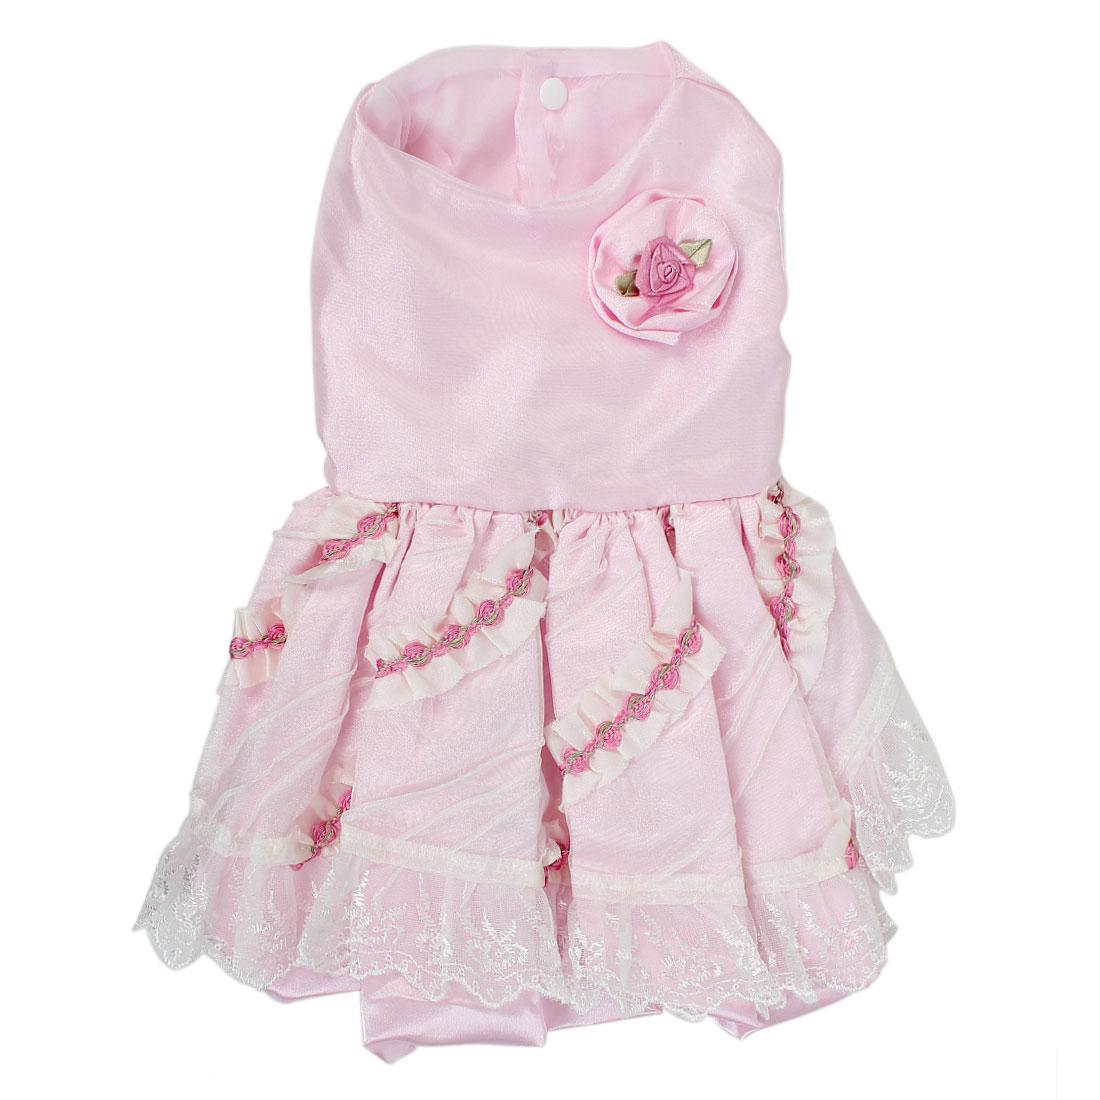 Pet Dog Doggie Rose Lace Decor Princess Wedding Dress Skirt Pink Size M